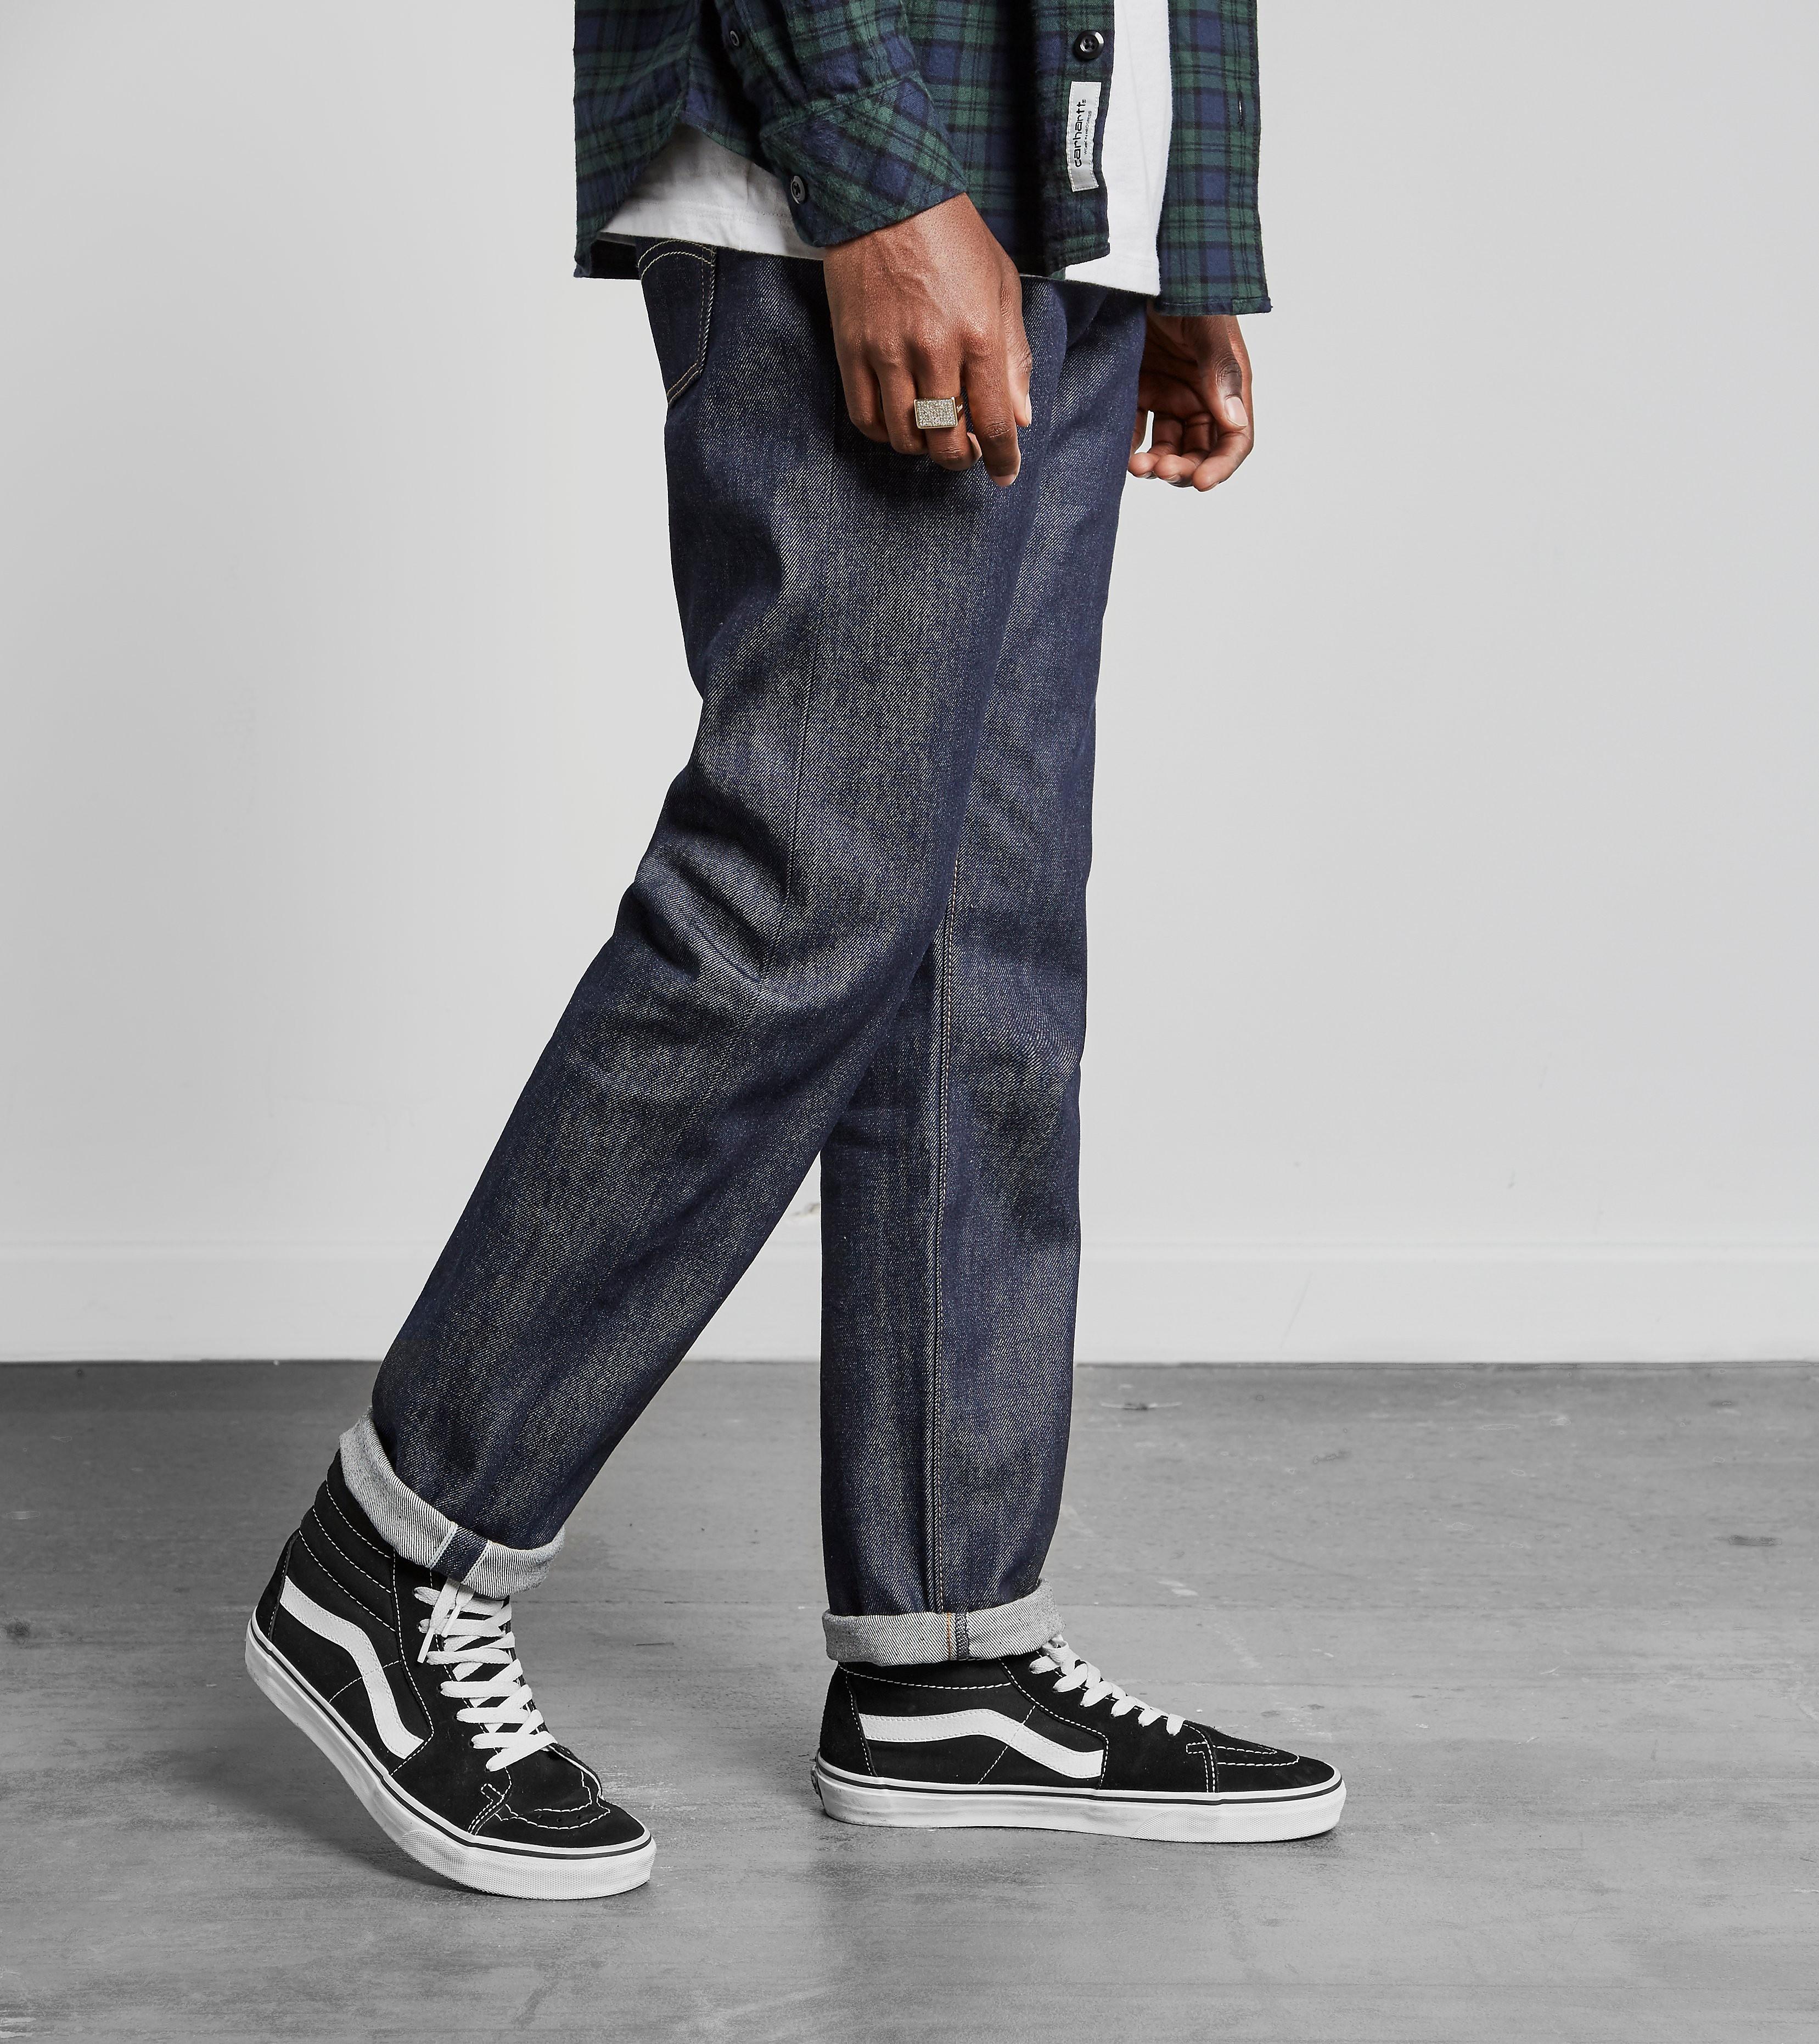 Levis 511 Rigid Selvedge Slim Fit Jeans